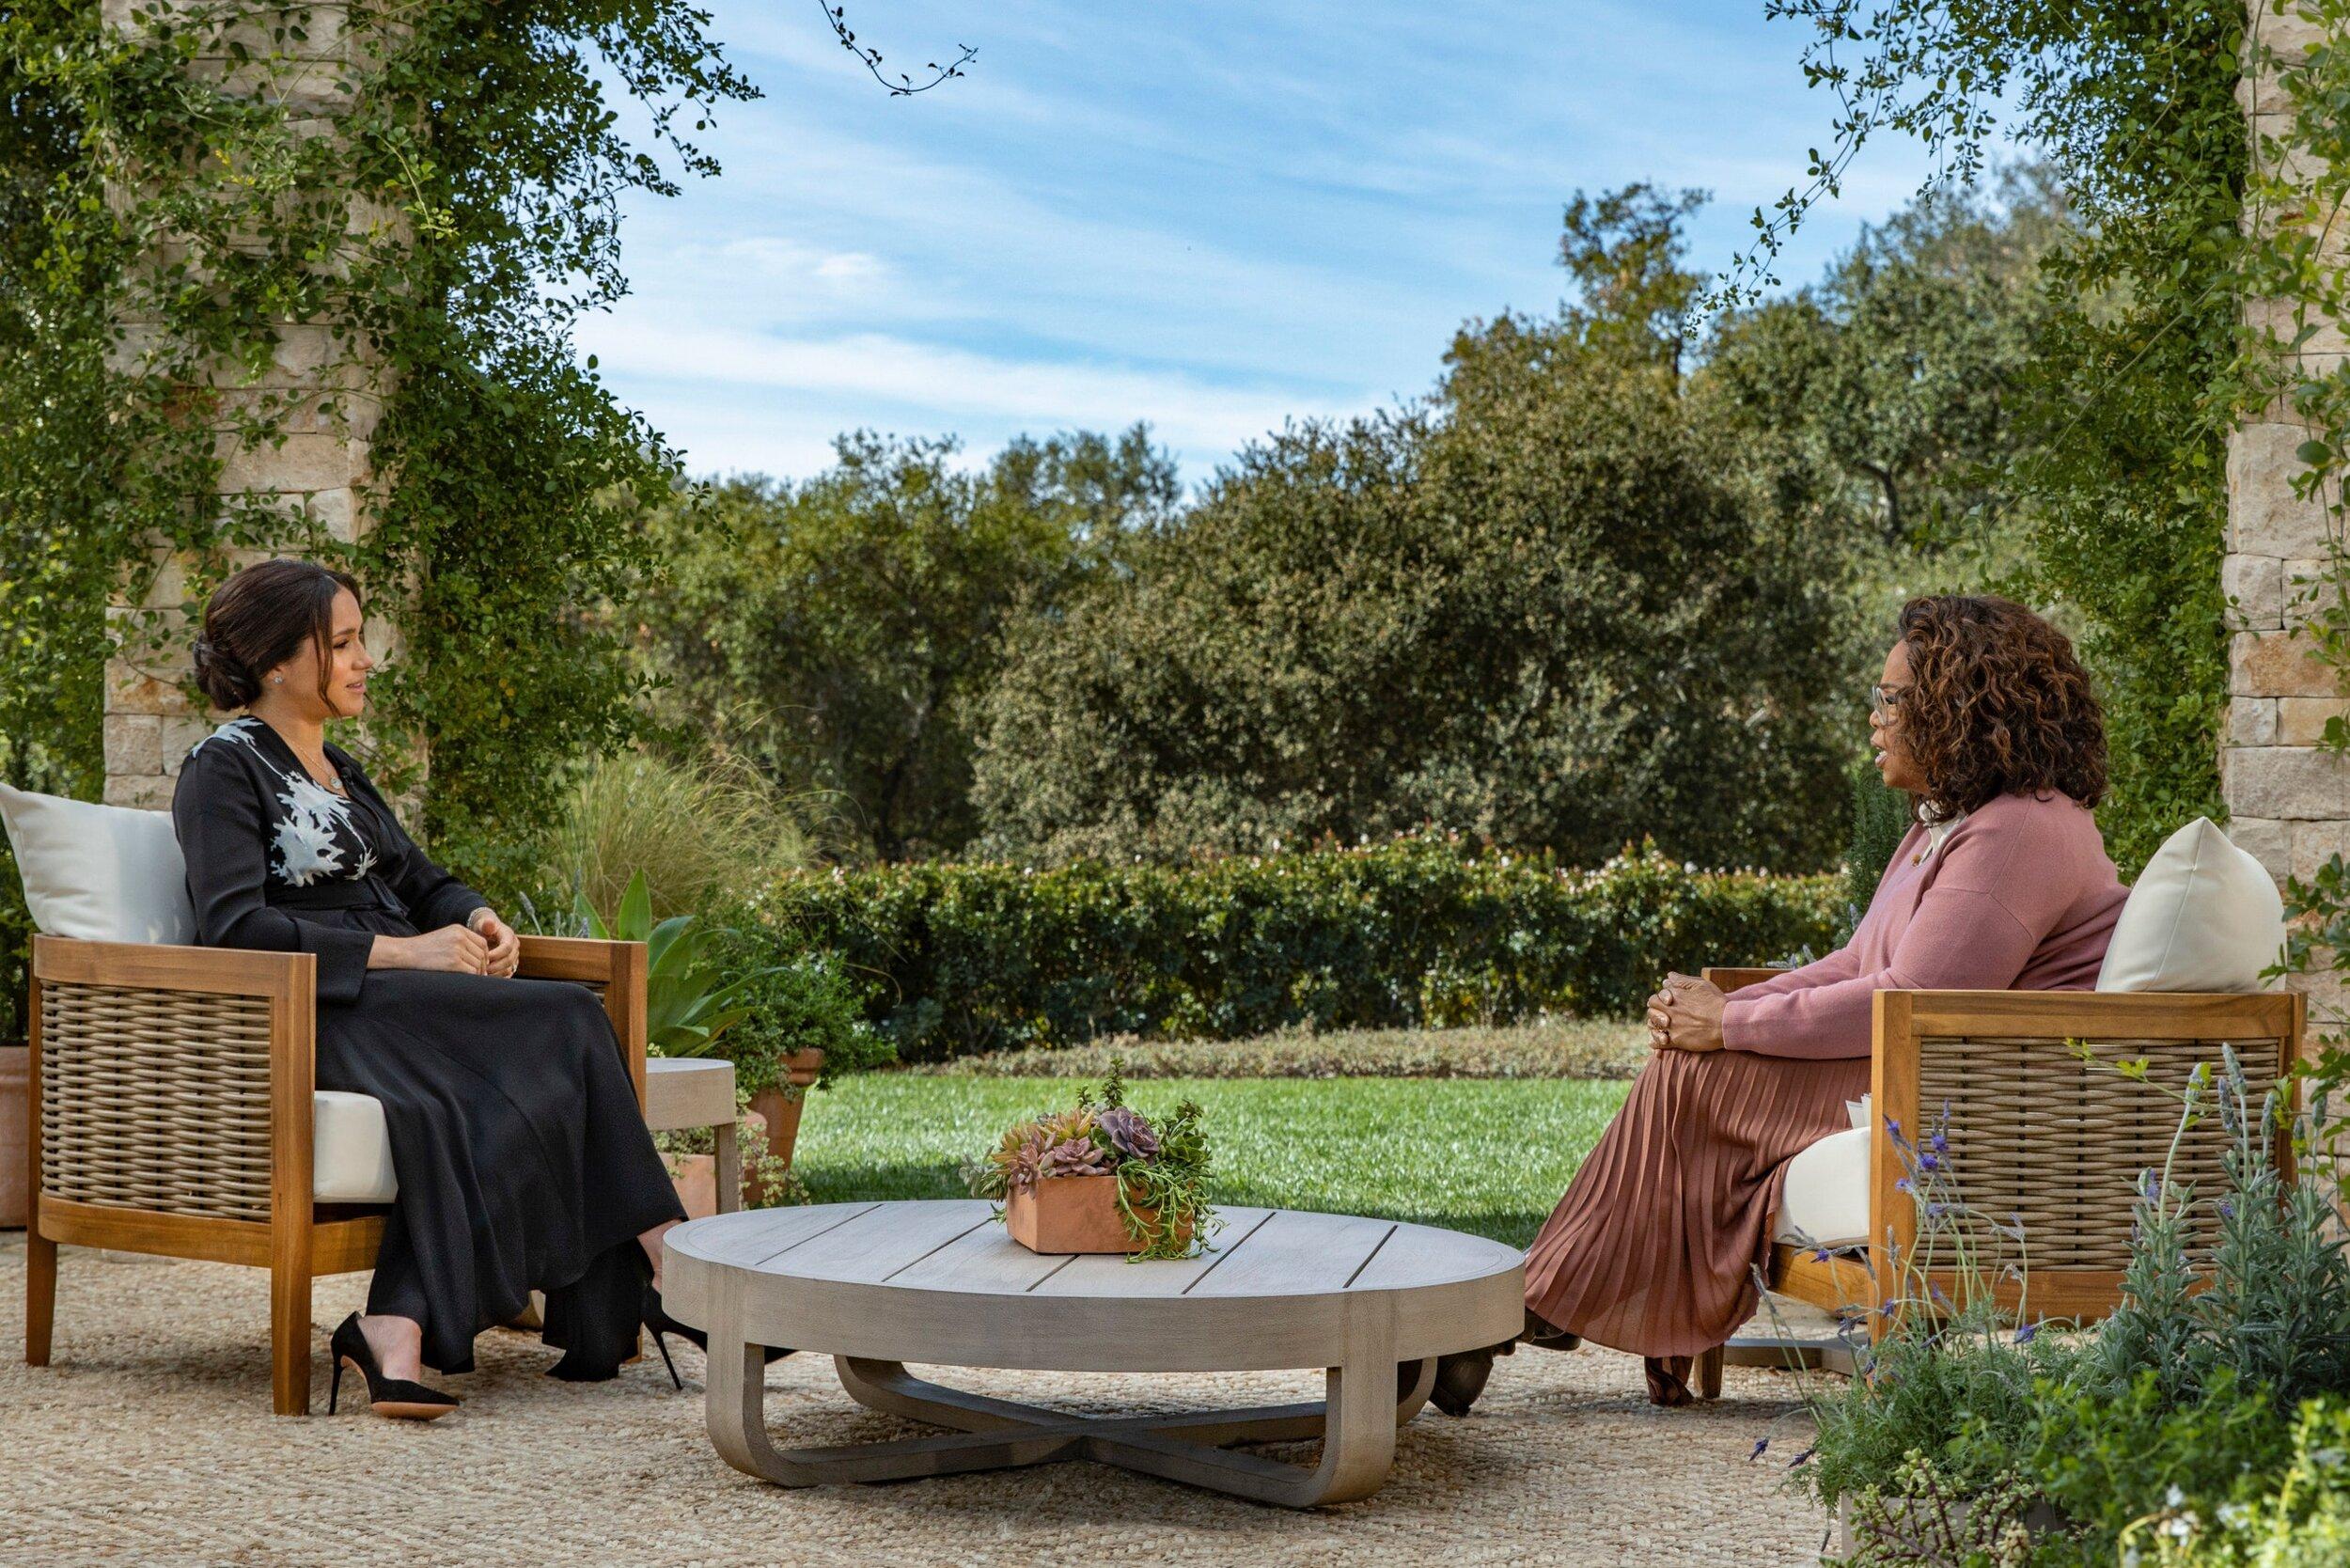 Photo: Oprah Network/CBS